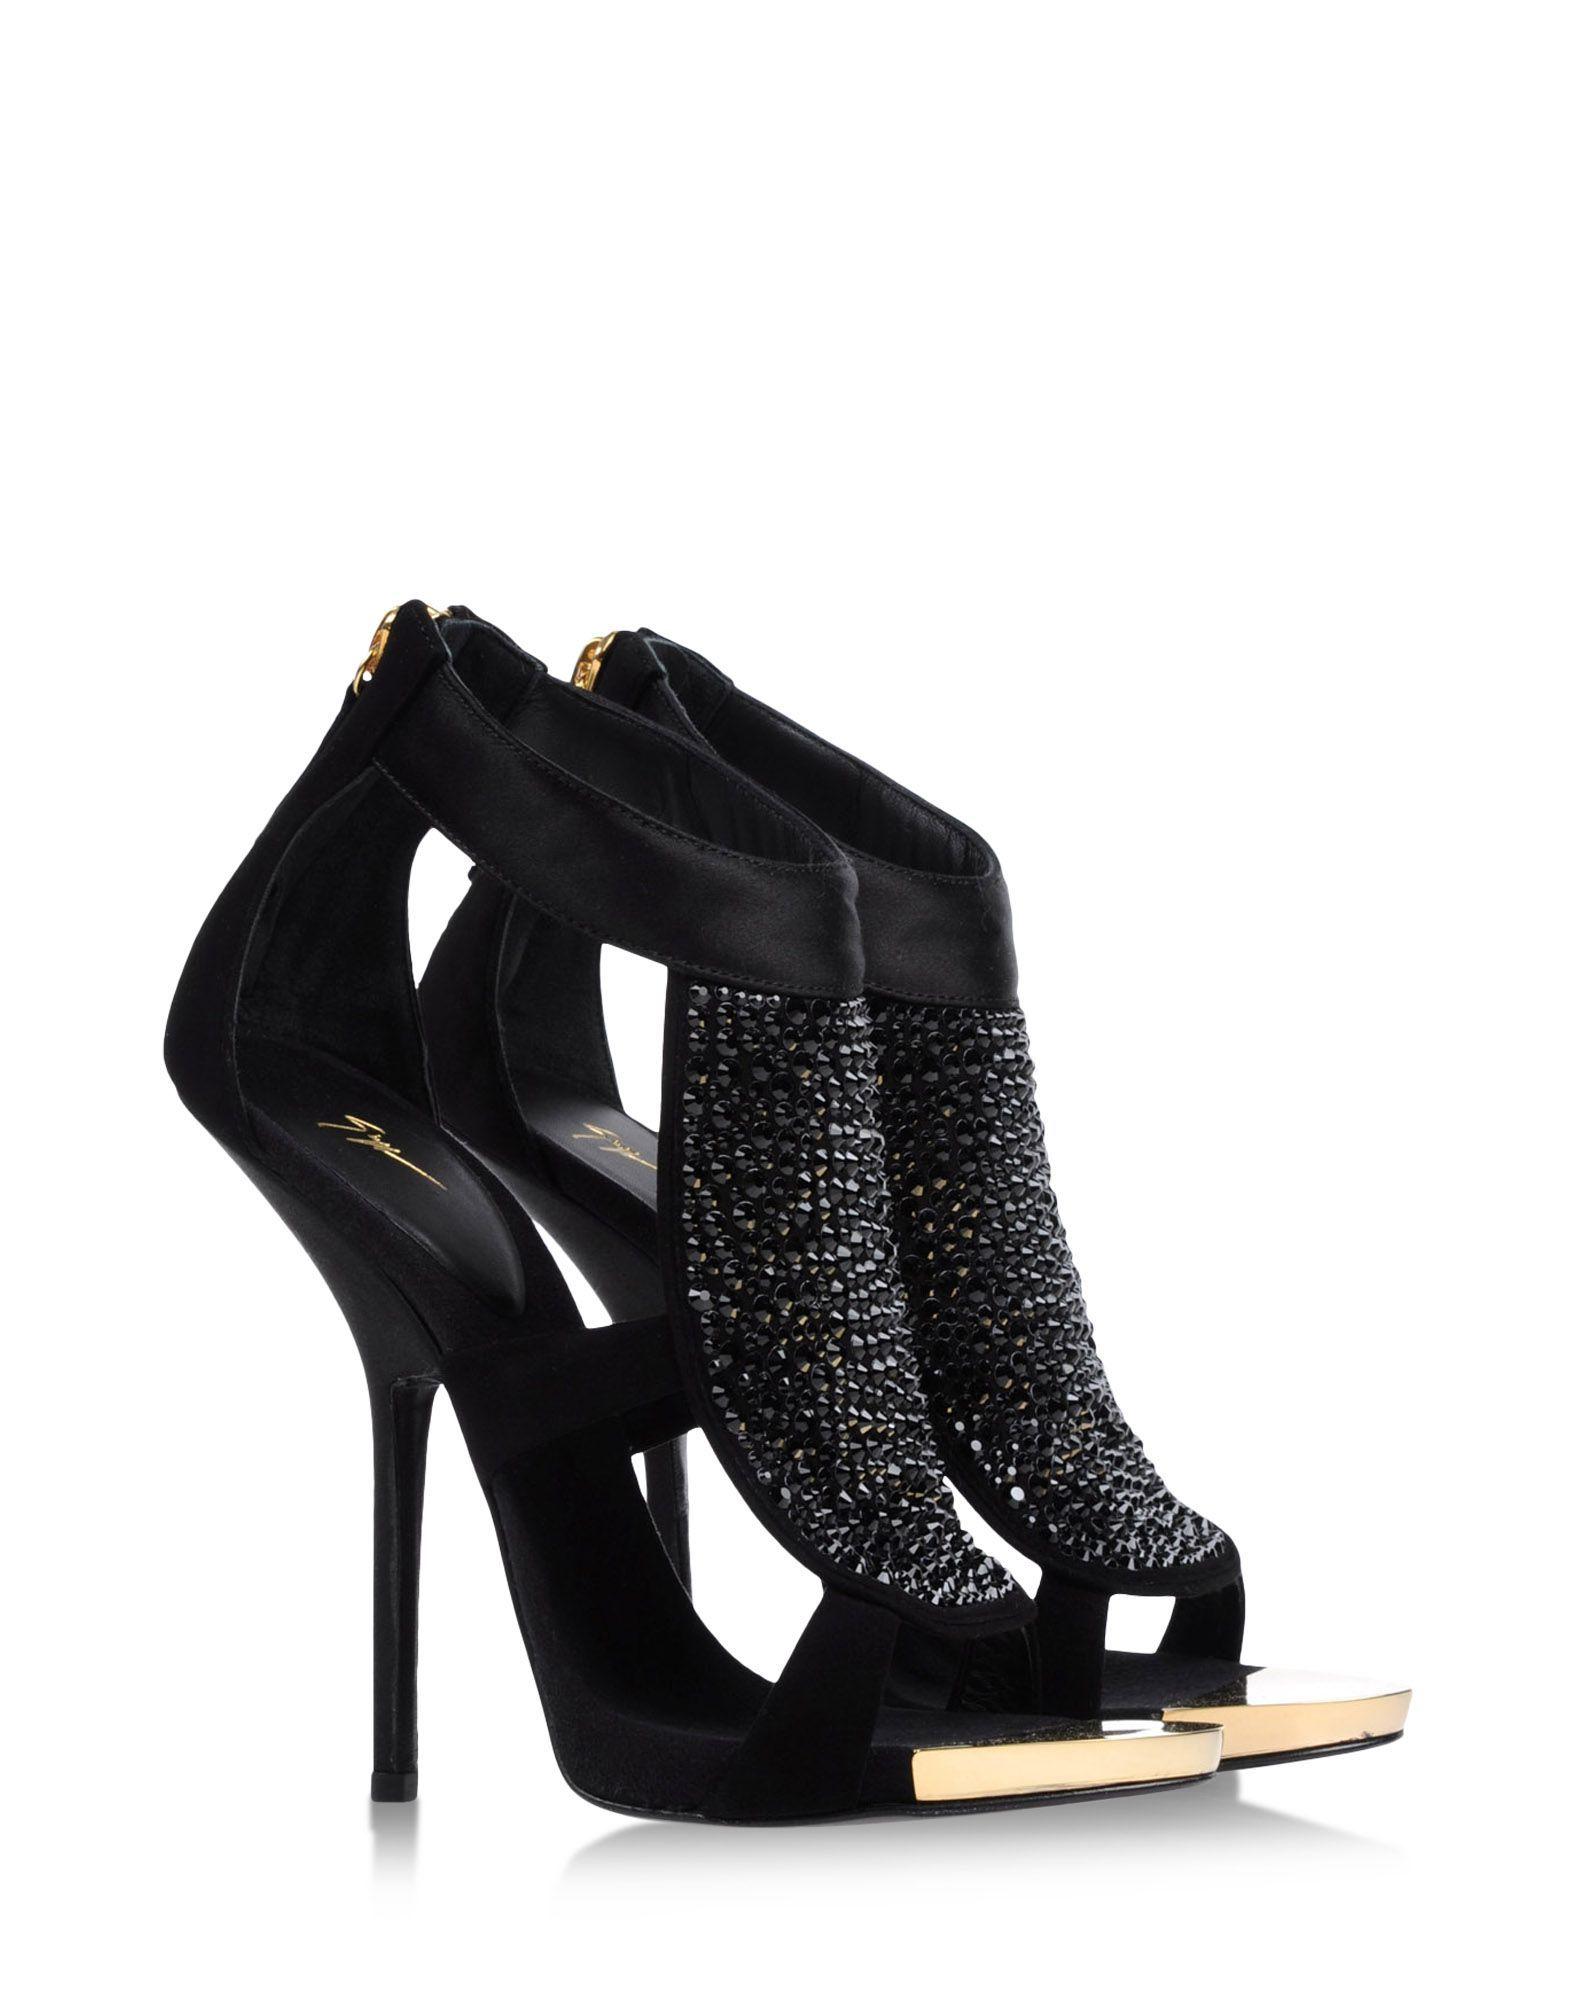 b17fcccb2 Shop online Women s Giuseppe Zanotti Design at shoescribe.com ...